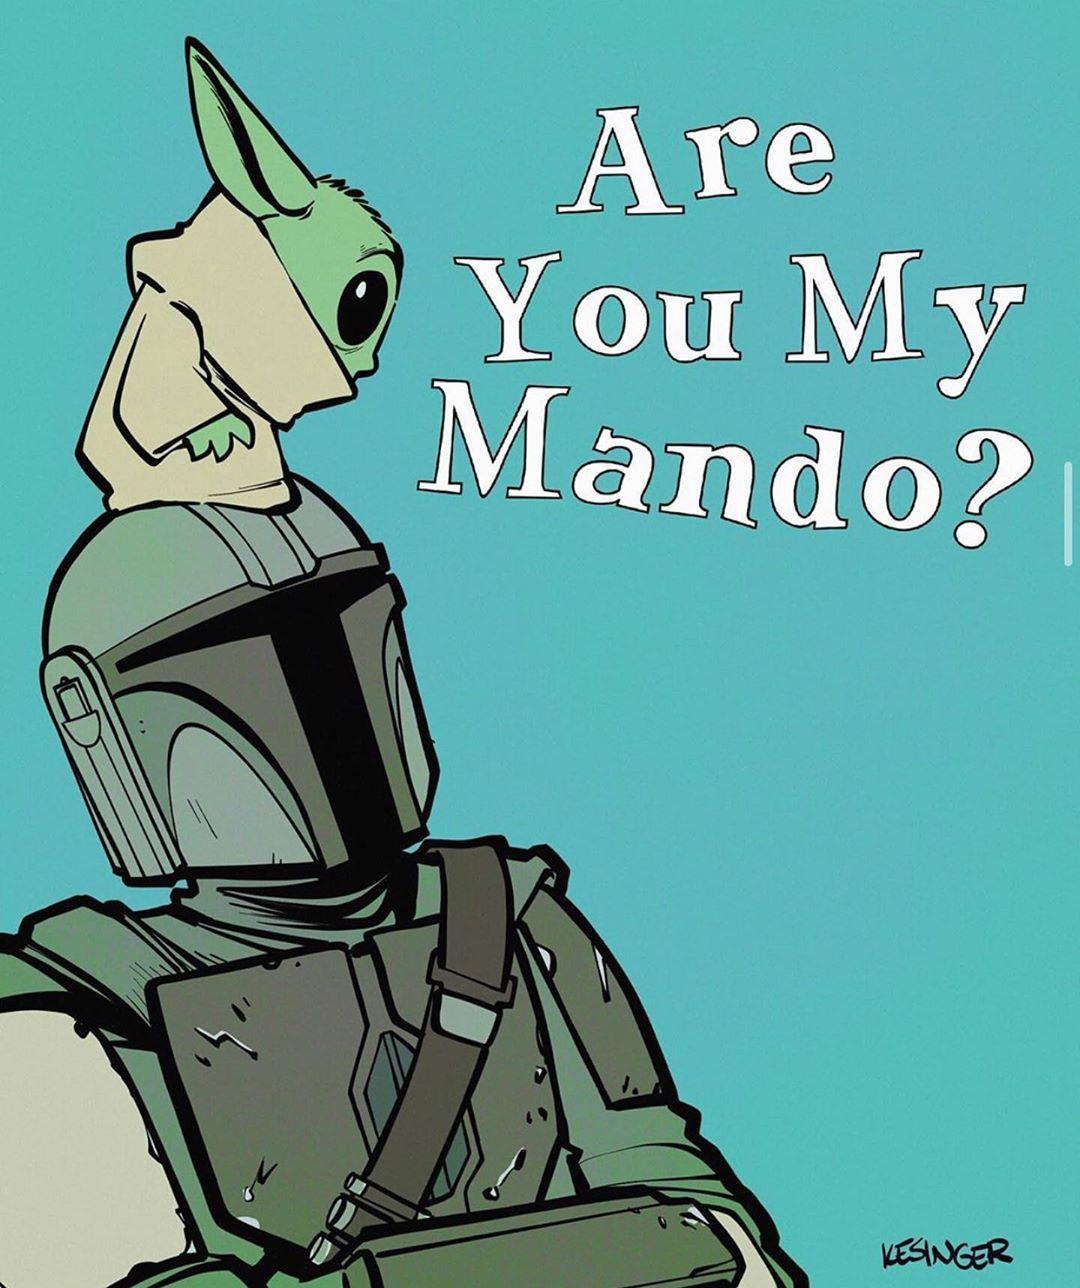 Star Wars Memes On Instagram Amazing Dr Seuss Spin Off Repost Briankesinger Star Wars Art Star Wars Humor Star Wars Memes